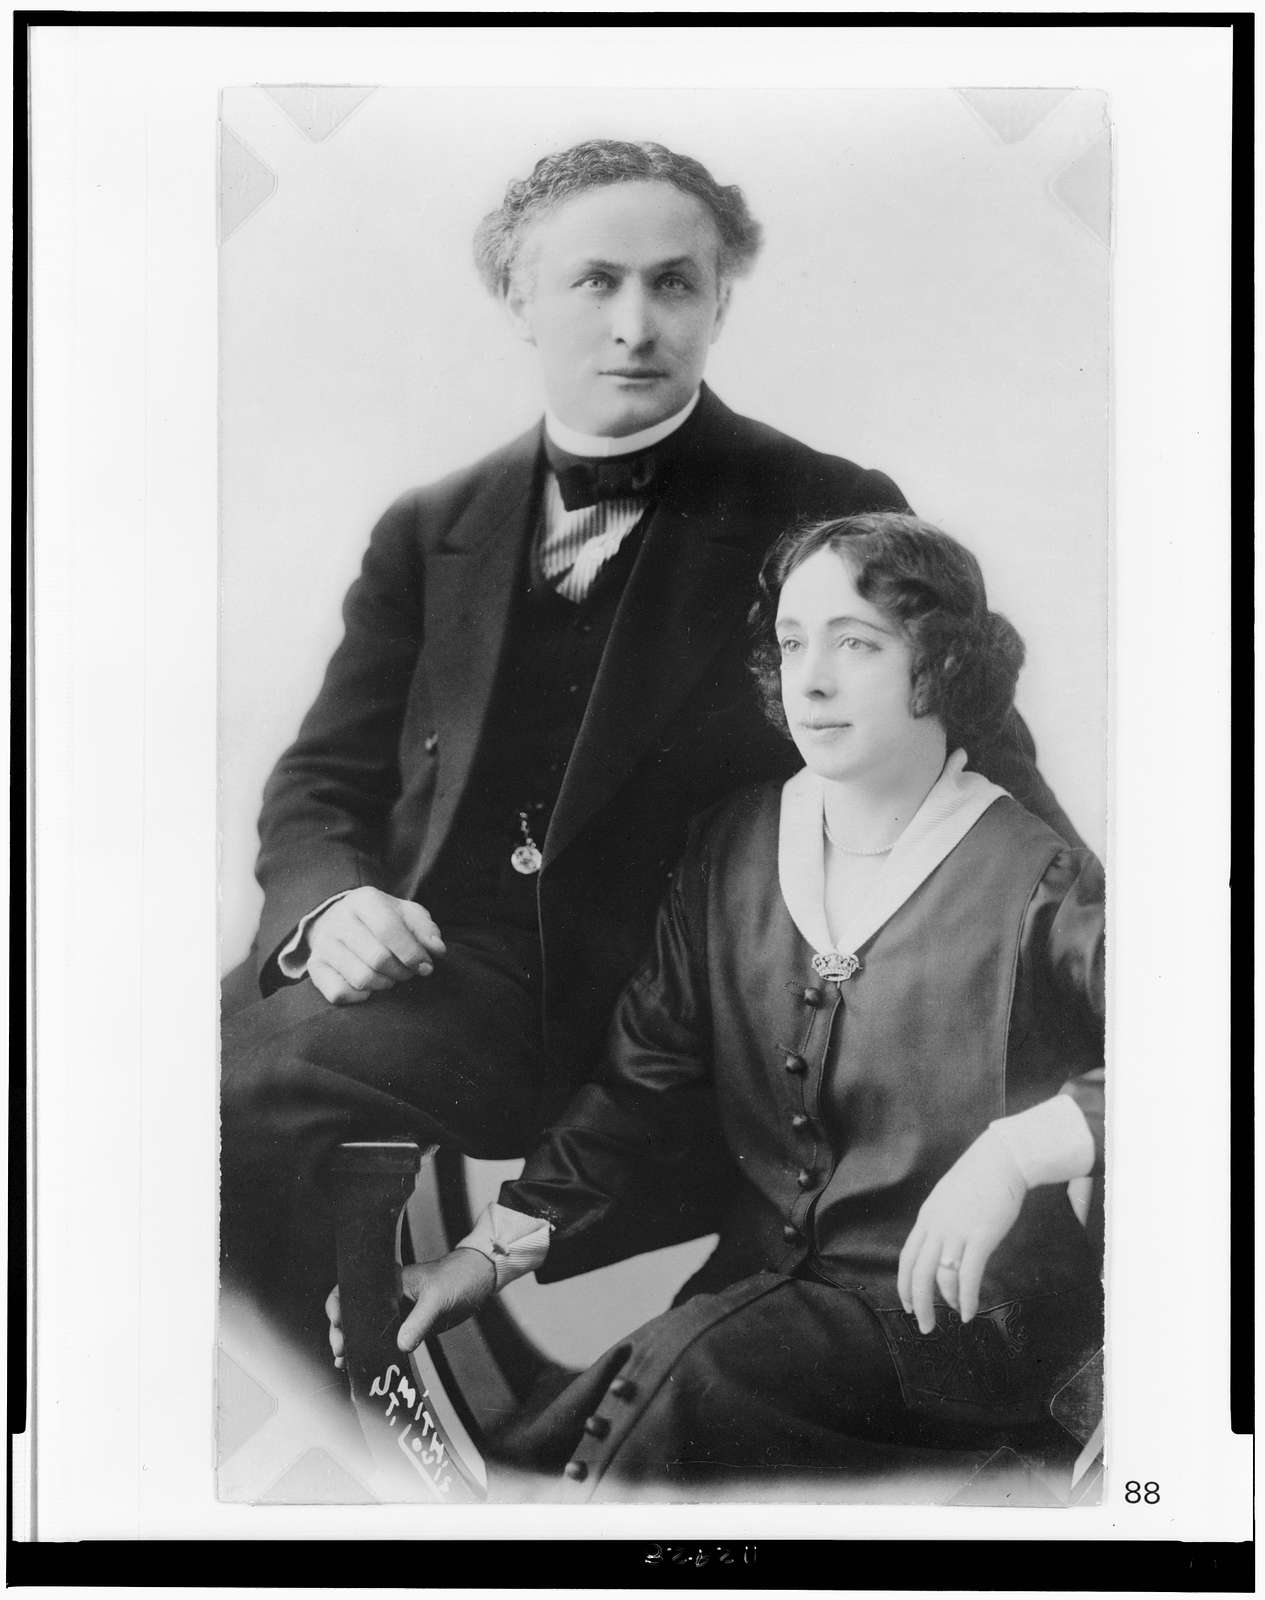 [Harry and Beatrice Houdini, half-length portrait, seated]